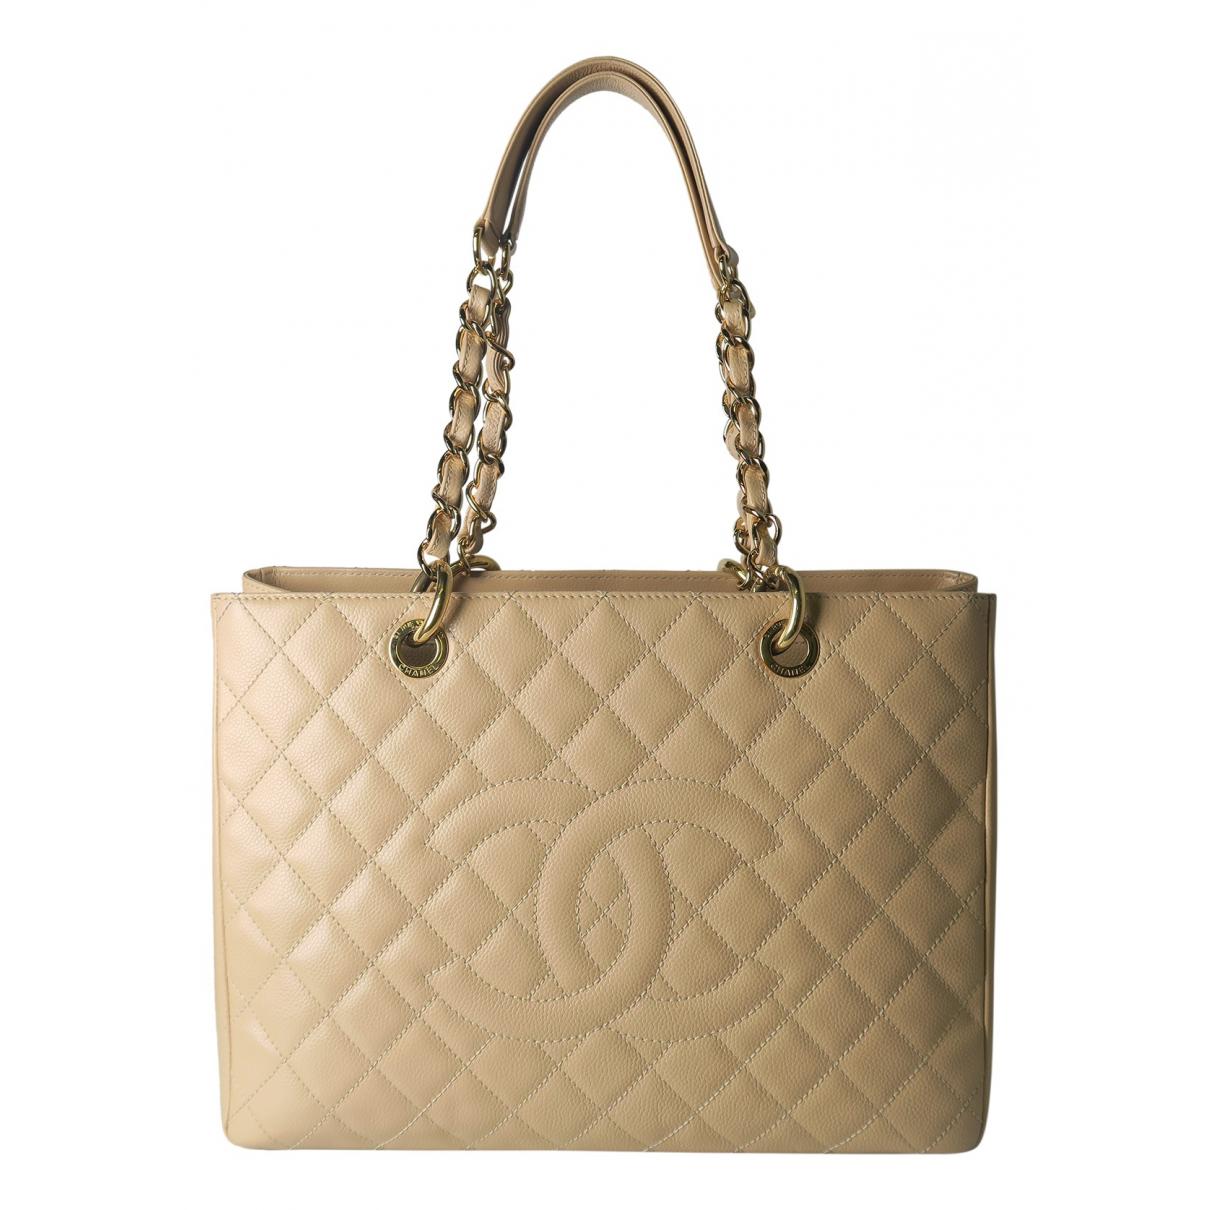 Chanel Grand shopping Handtasche in  Beige Leder